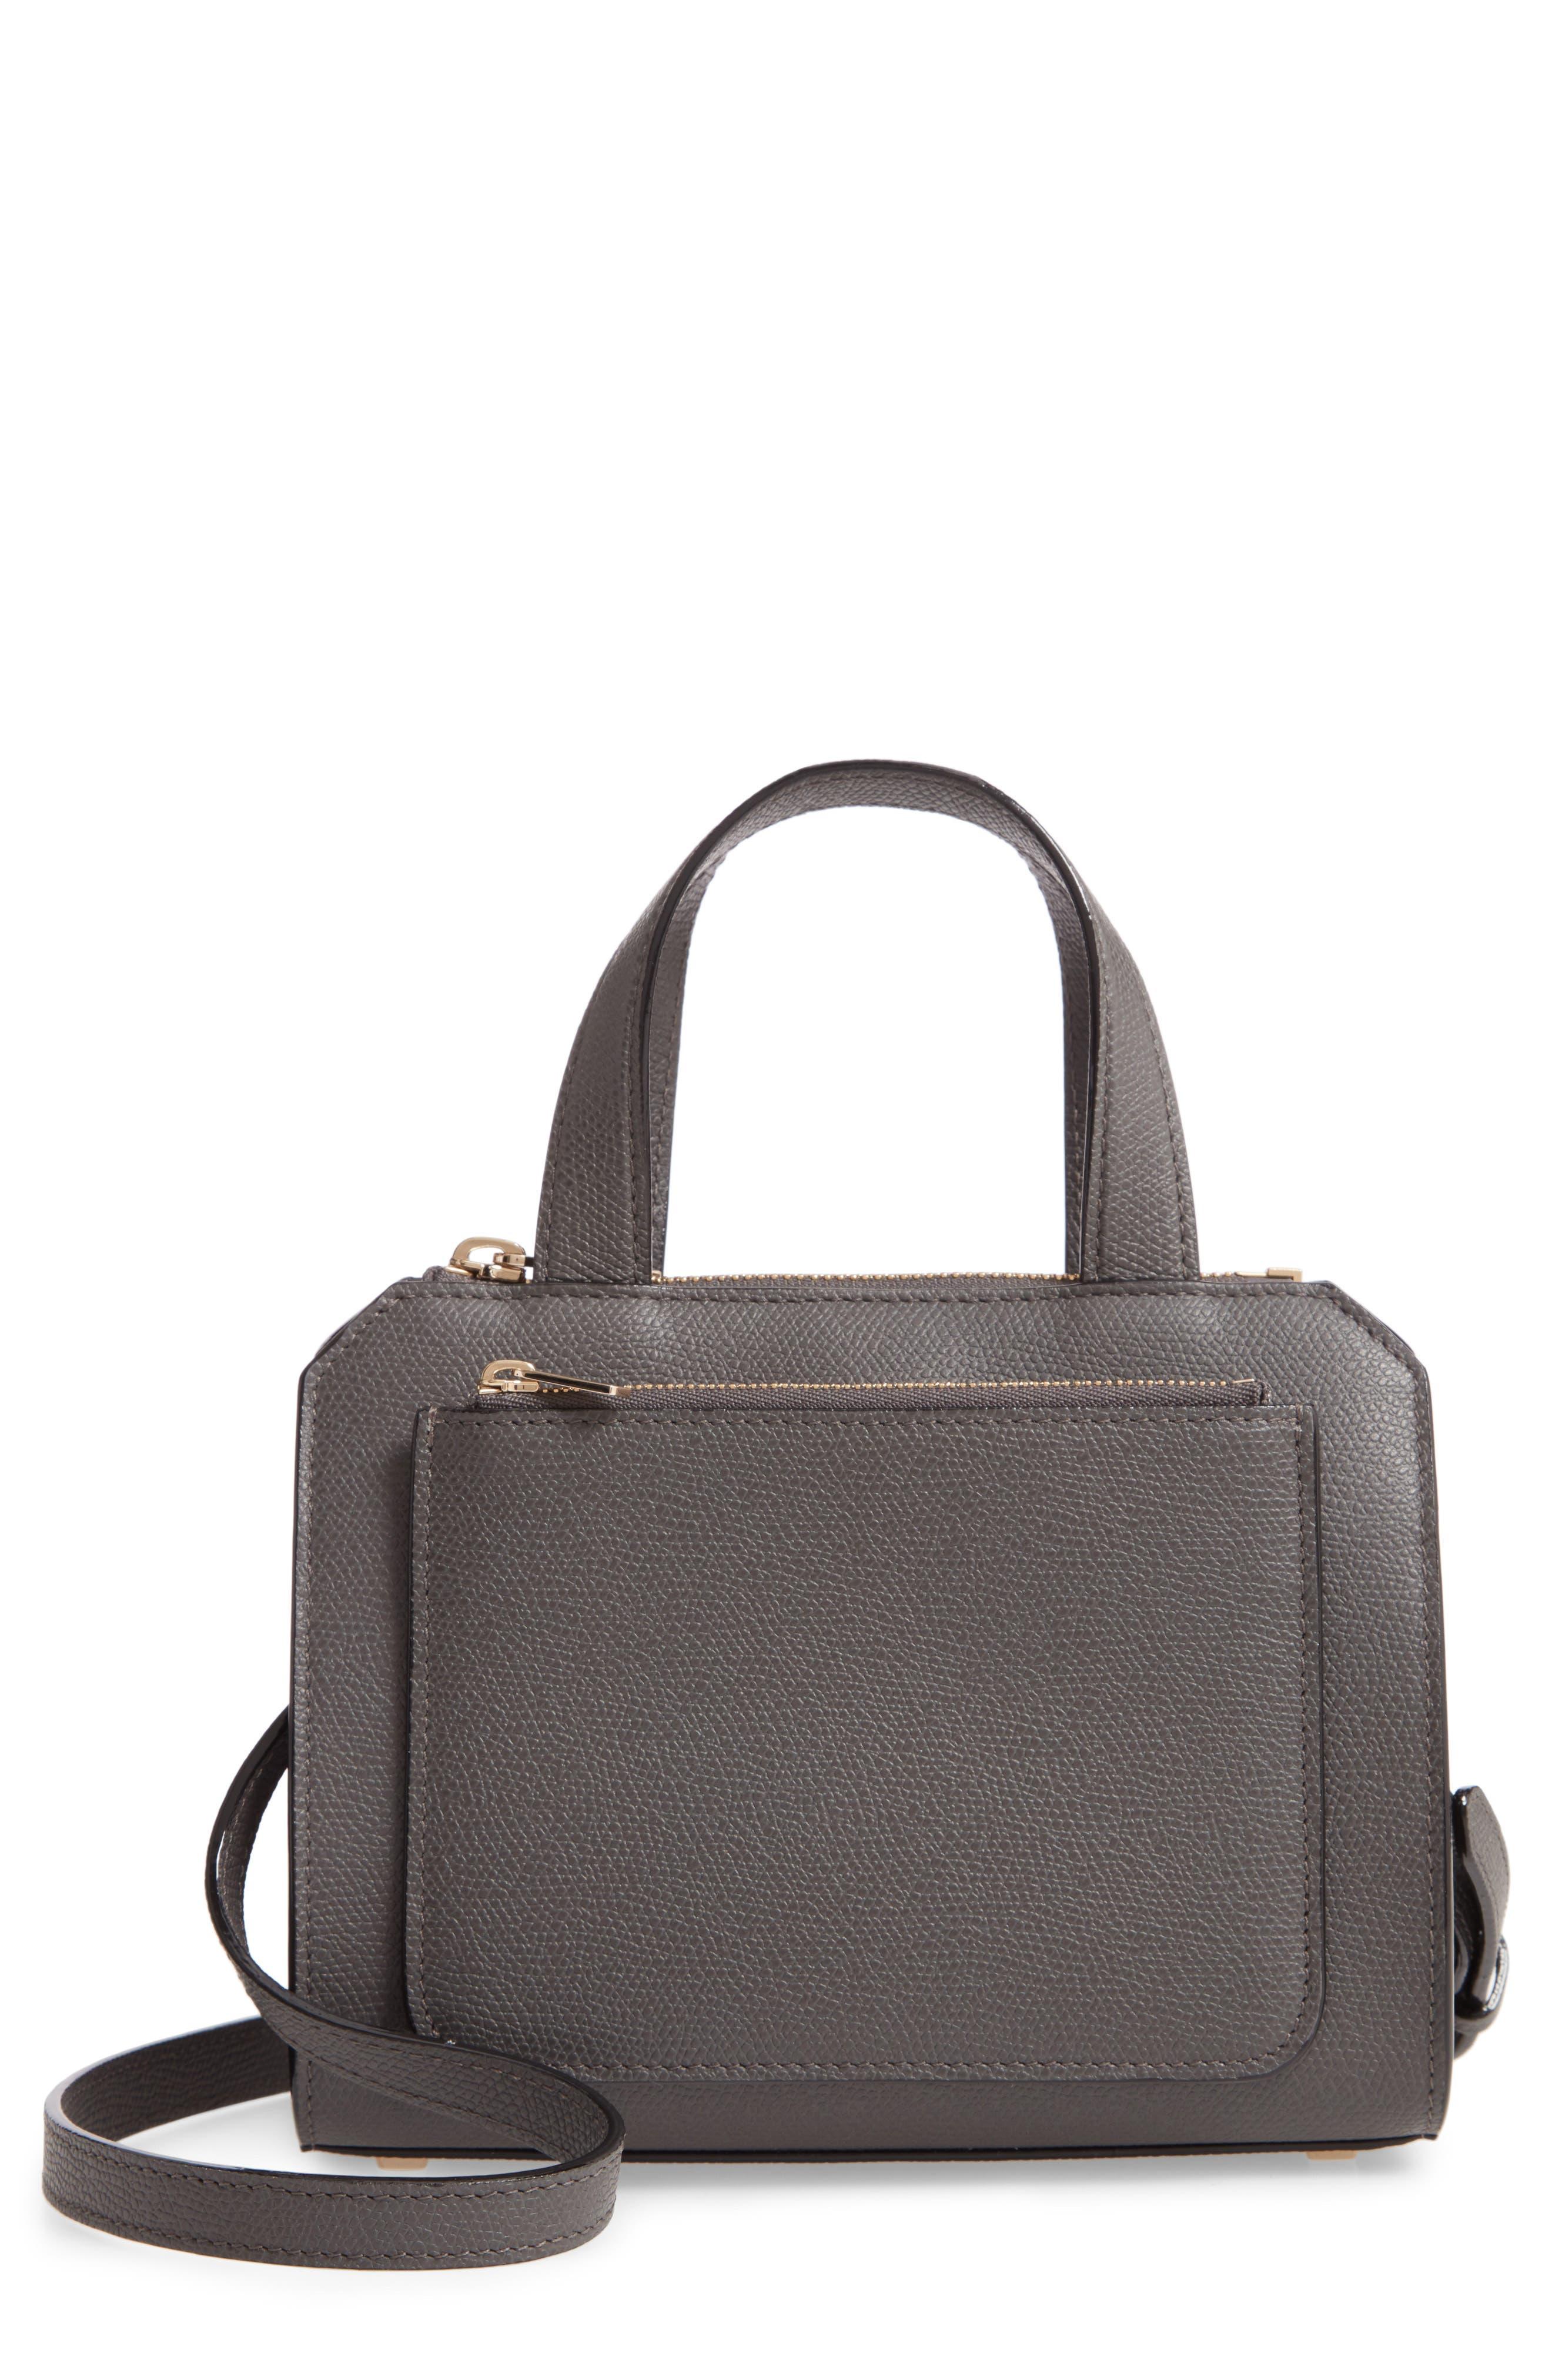 Valextra Mini Passepartout Leather Satchel   Nordstrom